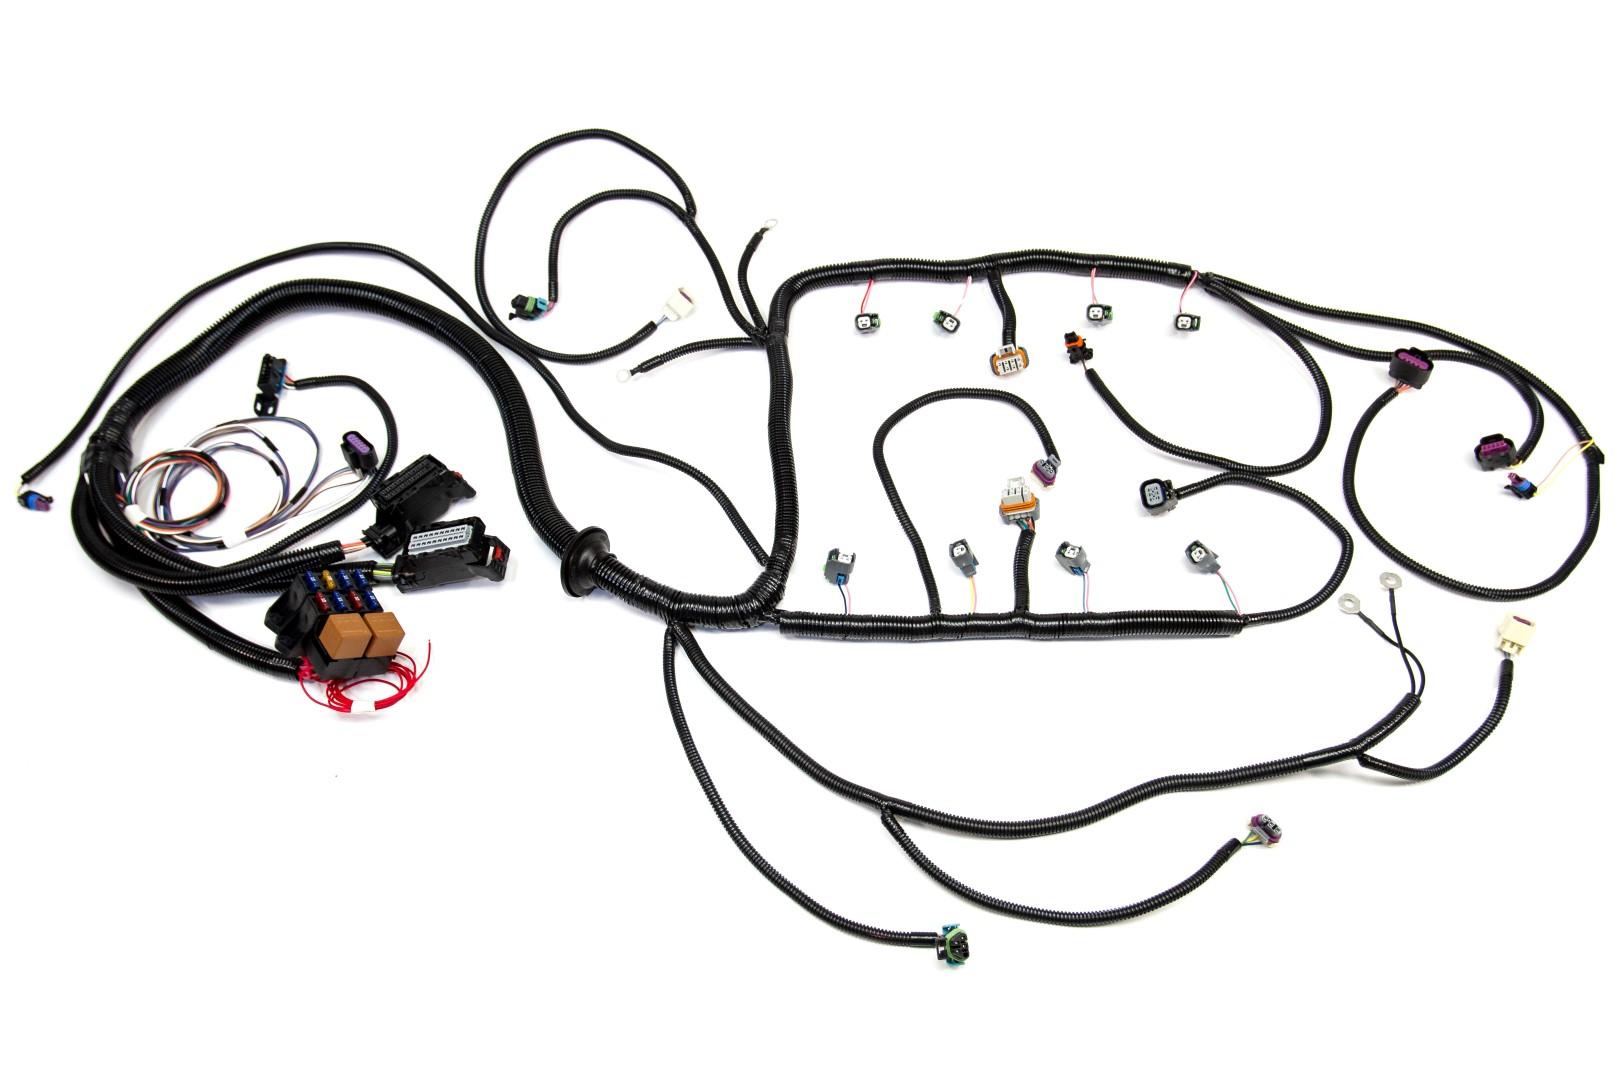 c3 corvette complete wiring harness